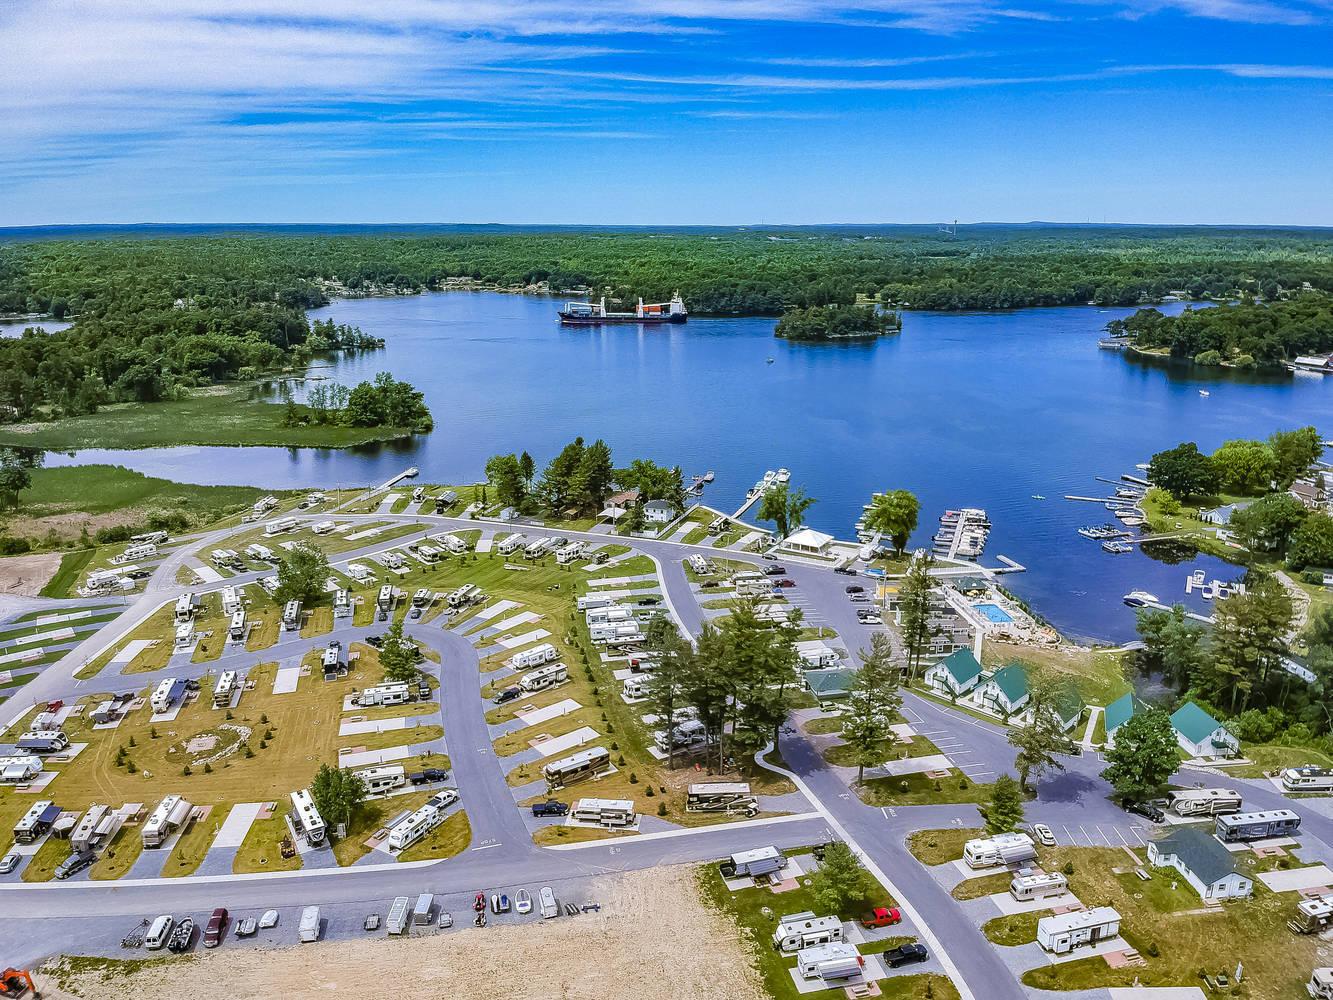 Swan Bay Resort 1000 Islands Premier Rv Resort Vacation